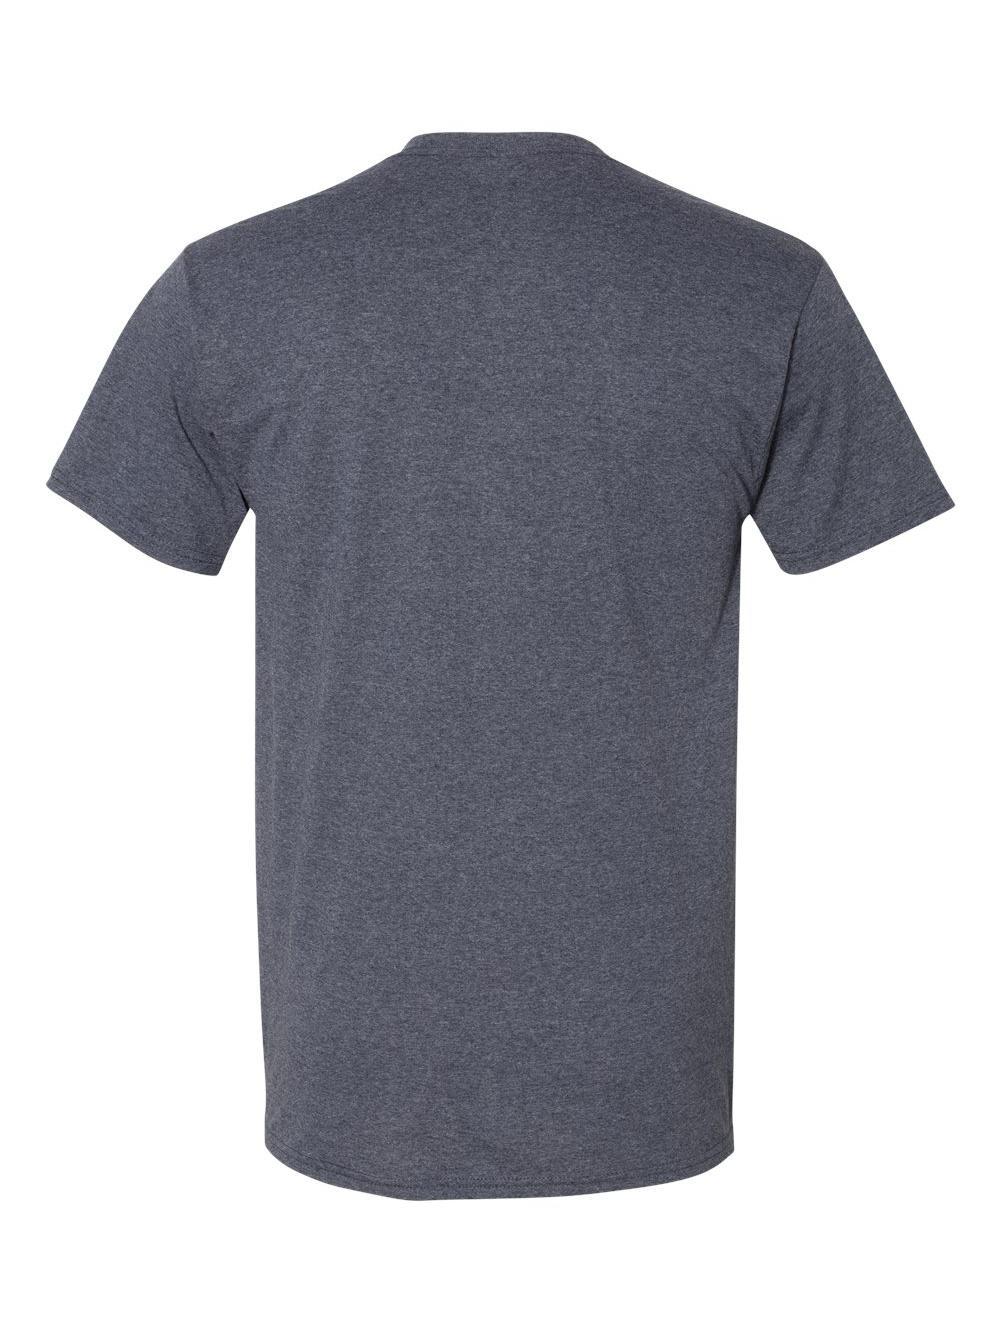 Fruit-of-the-Loom-HD-Cotton-Short-Sleeve-T-Shirt-3930R thumbnail 139